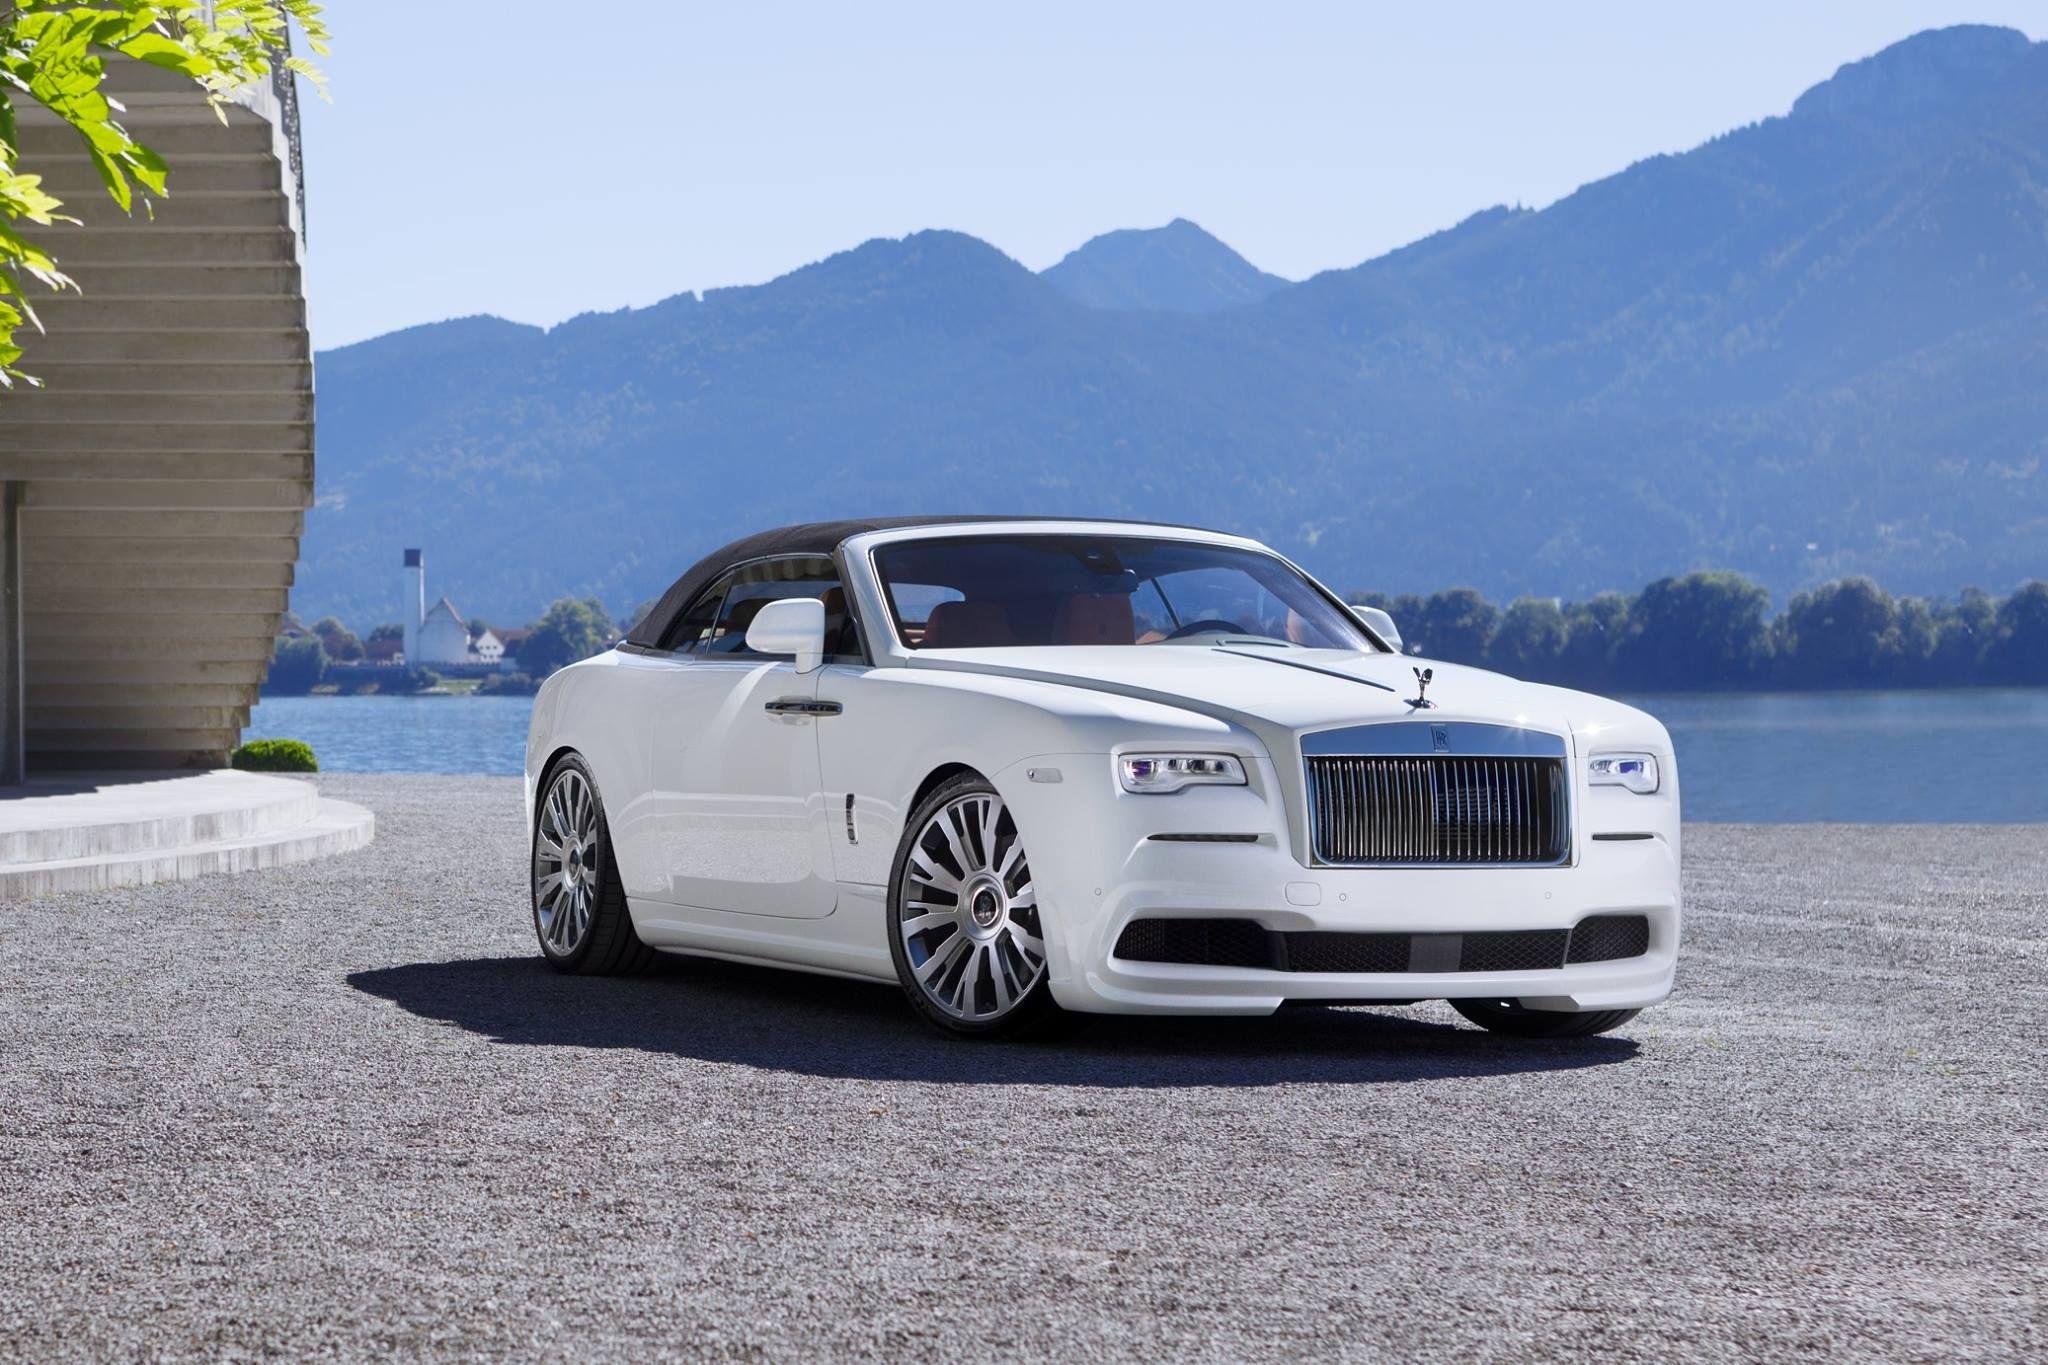 Novitec Group Spofec Rolls Royce Dawn Rolls Royce Dawn White Rolls Royce Rolls Royce